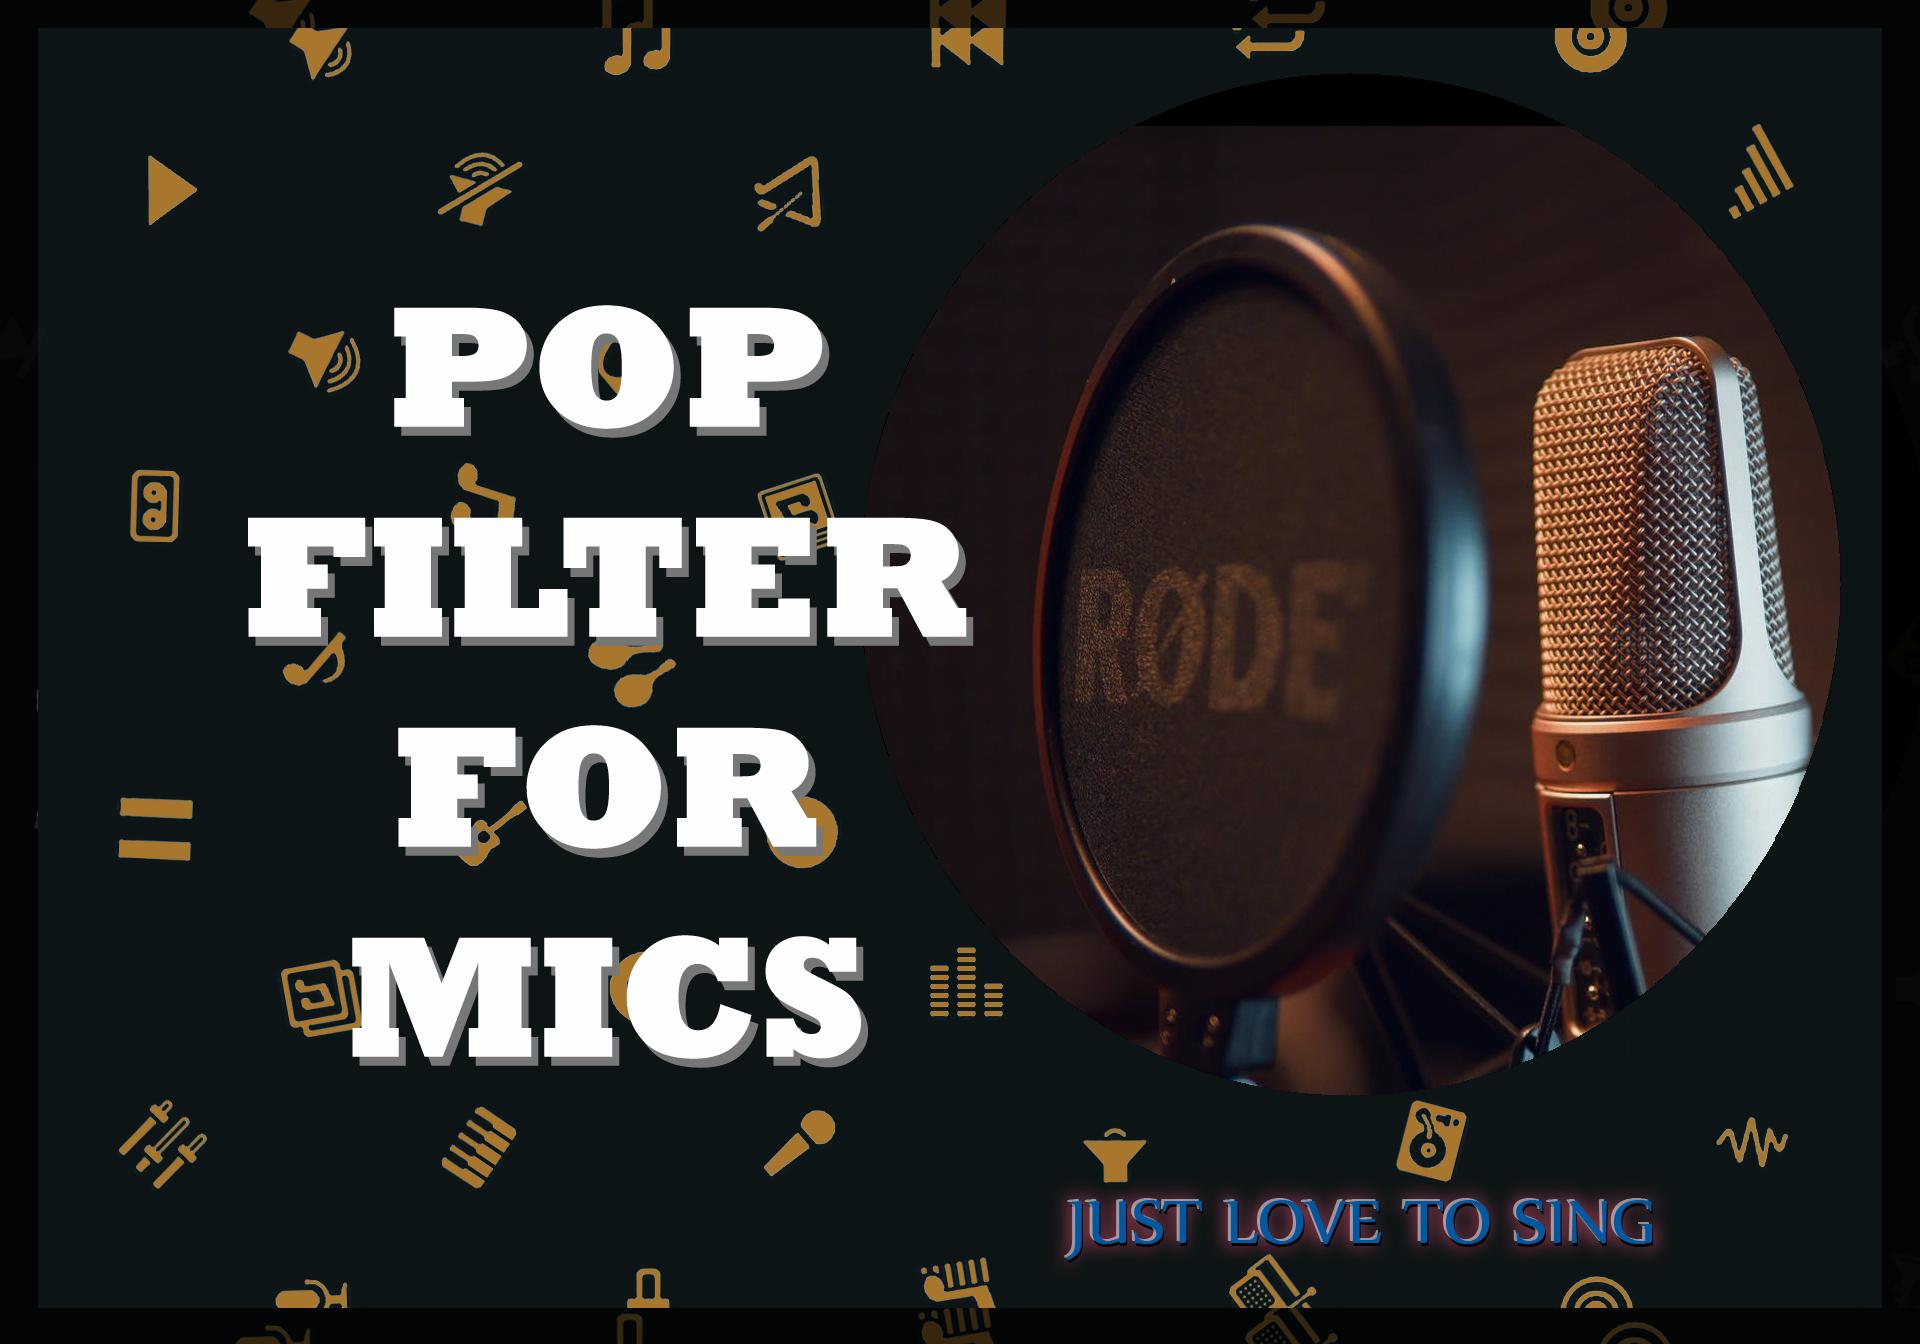 Pop Filter For Mic